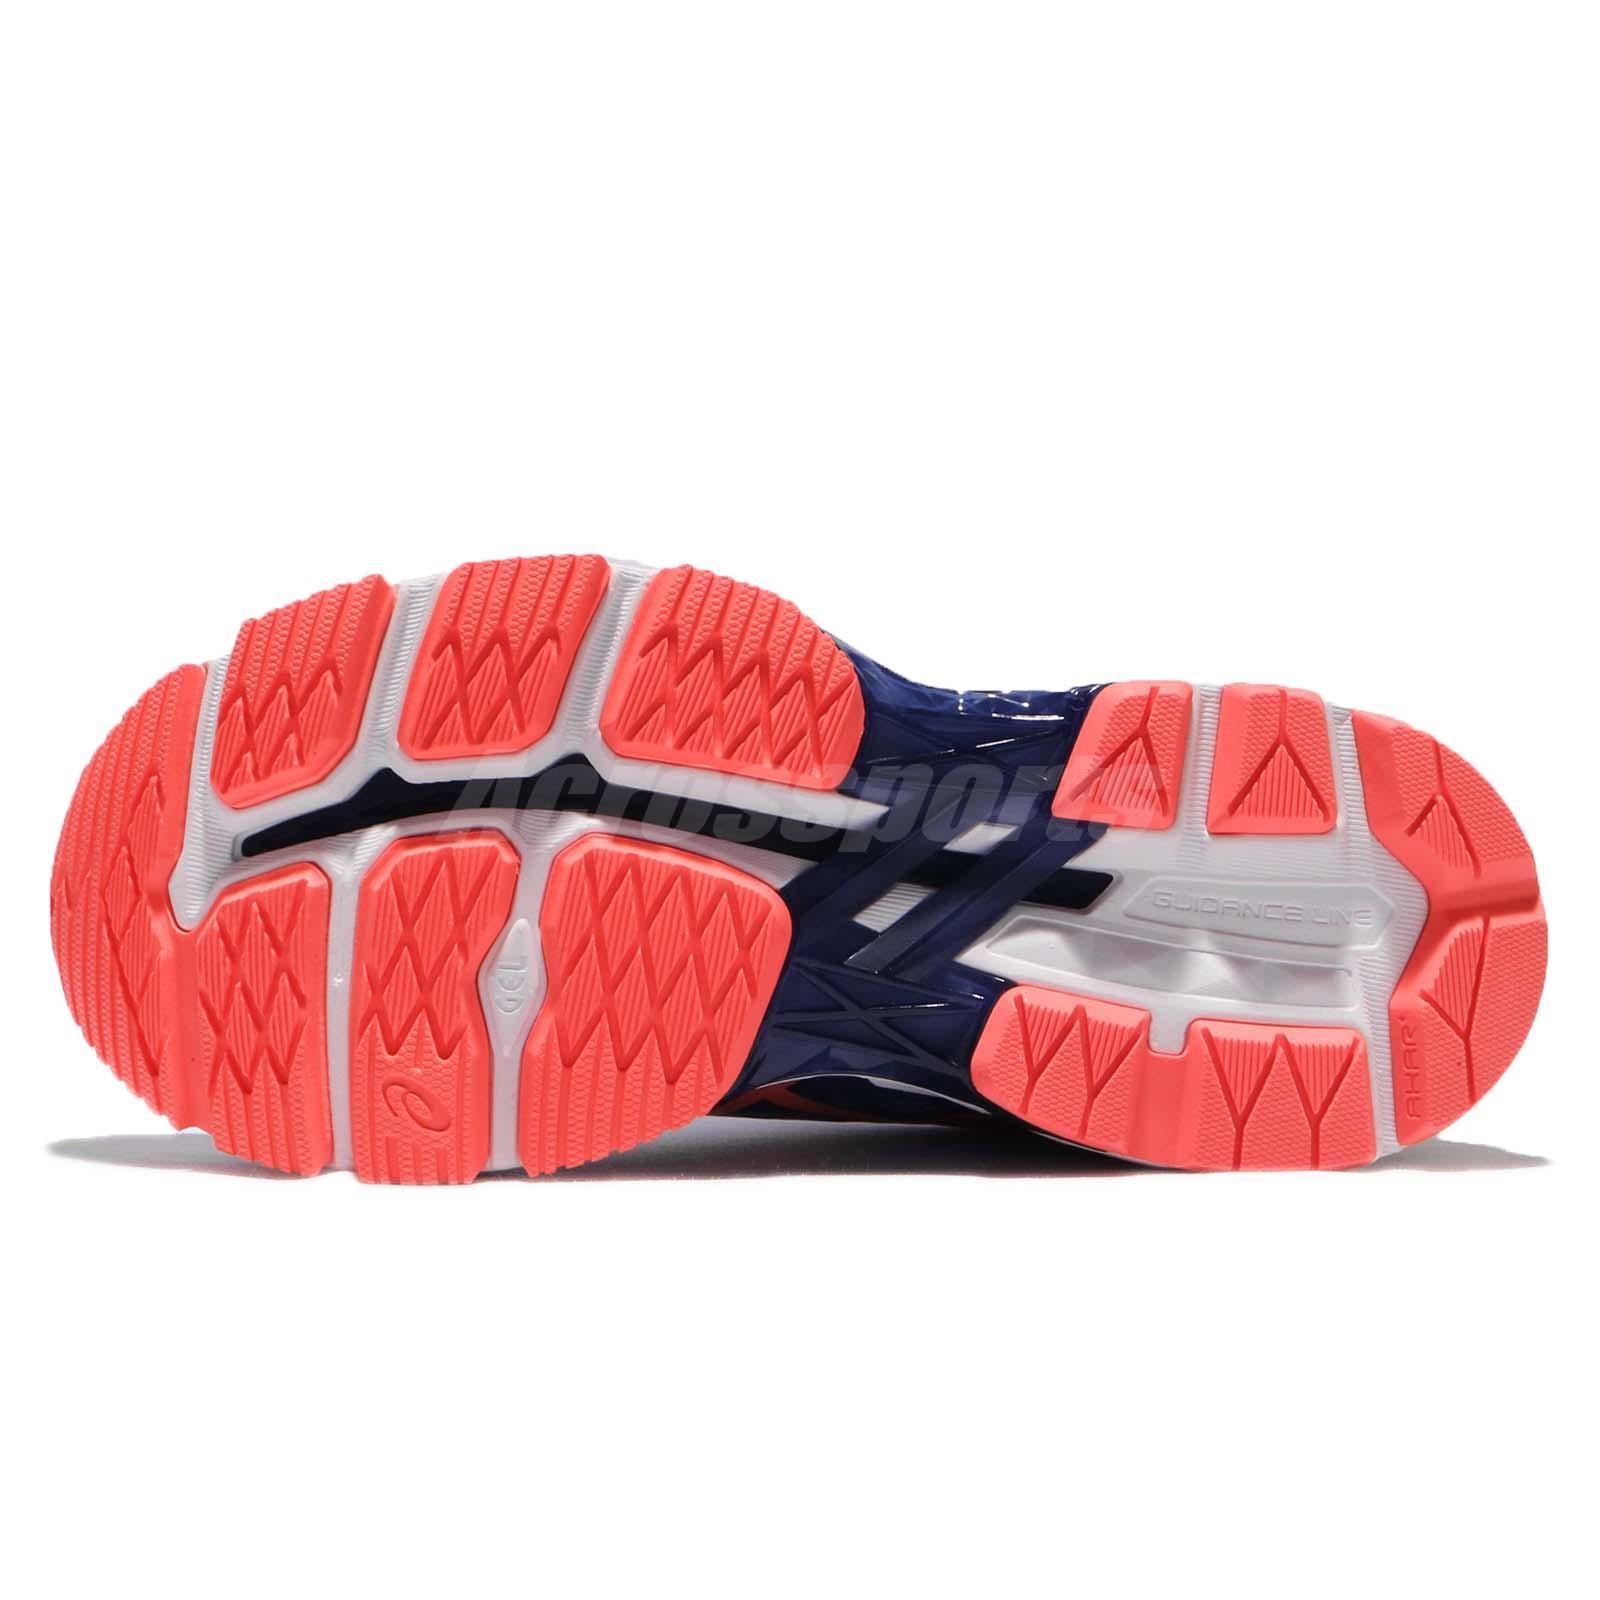 1580f3cd09 Asics GT-2000 5 Regatta Blue Flash Coral Women Running Shoes ...